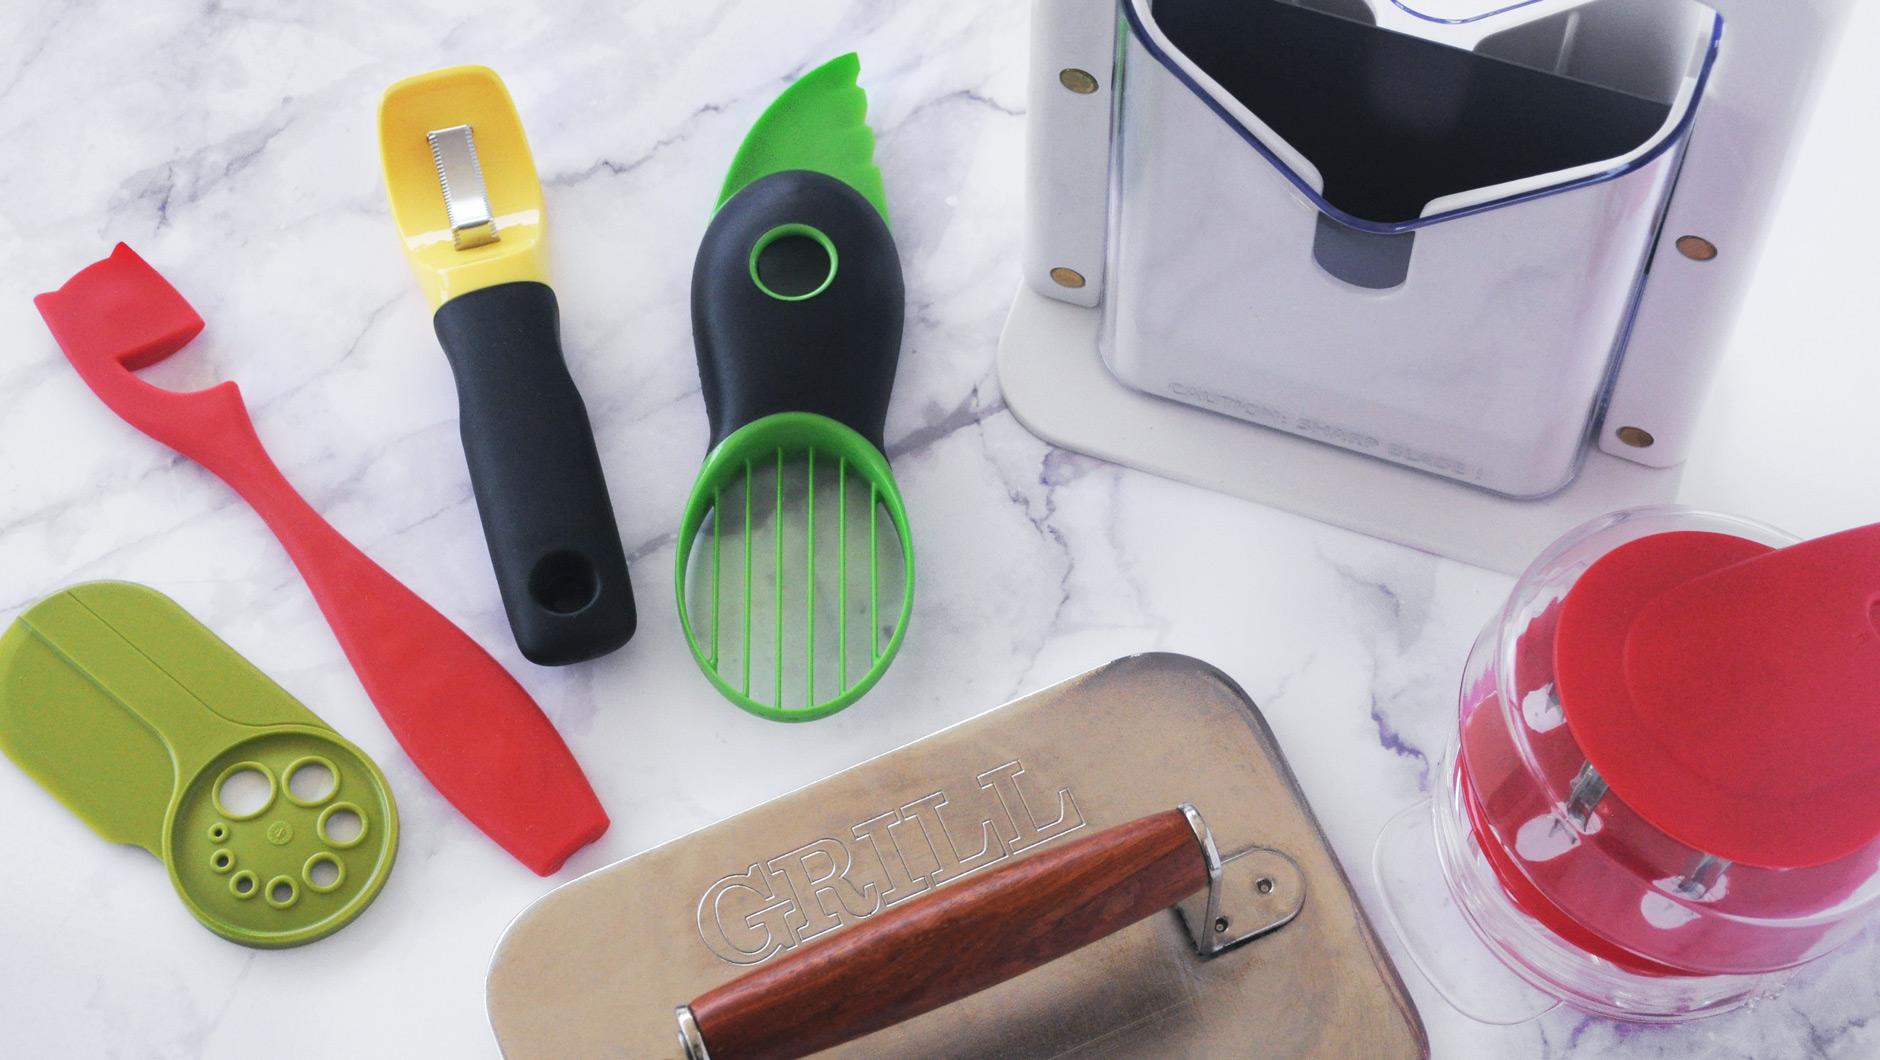 7 Unique Kitchen Gadgets  Whats for Dinner